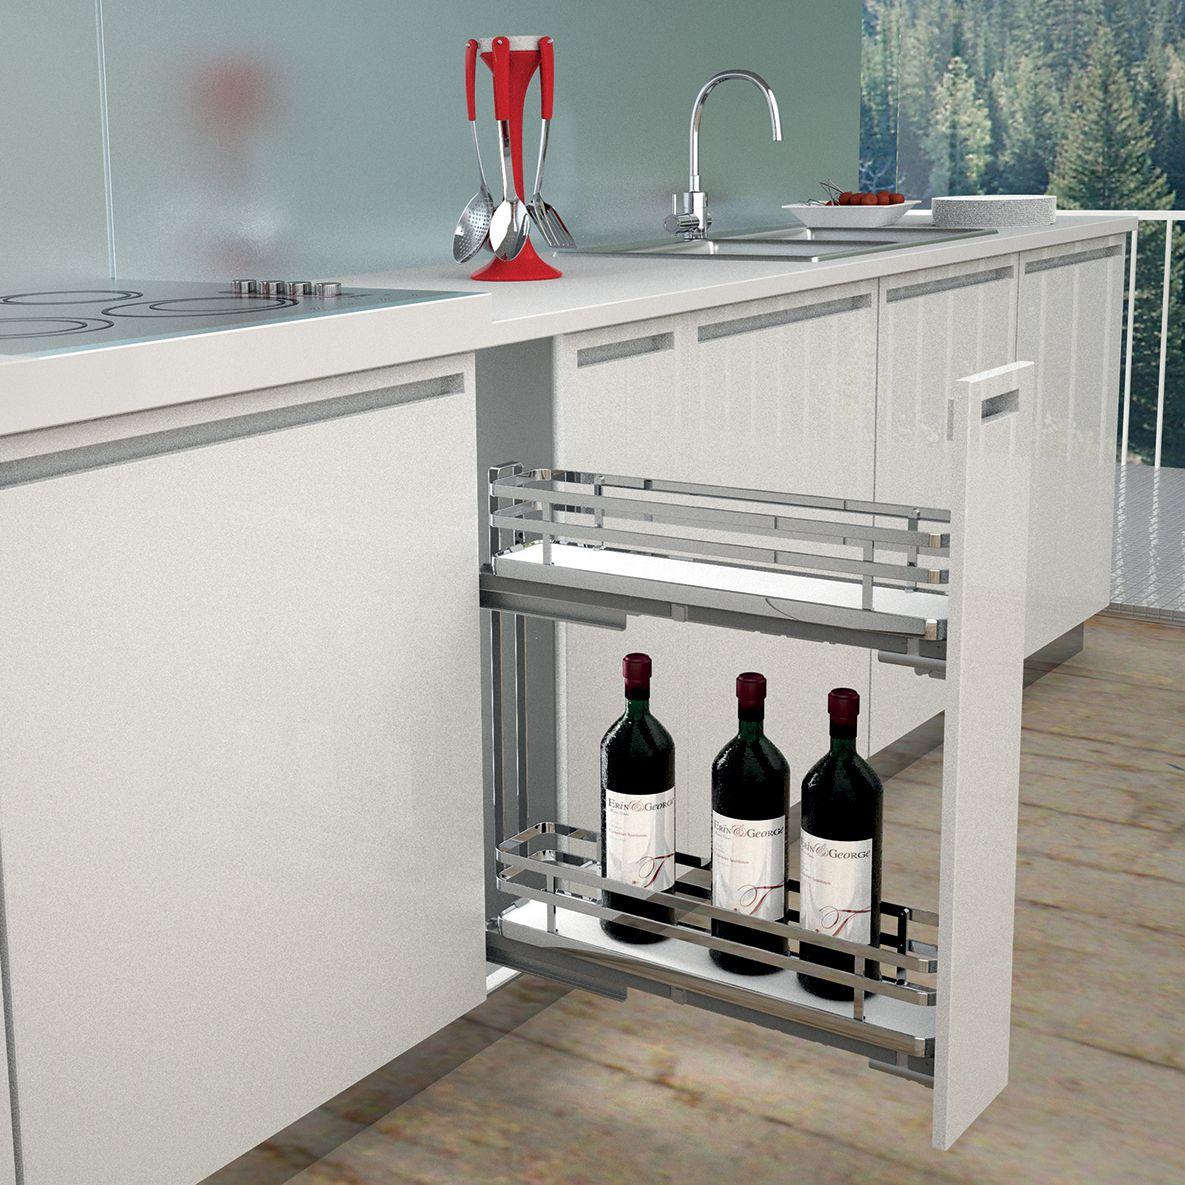 meuble porte bouteilles pices cuisines teisseire. Black Bedroom Furniture Sets. Home Design Ideas